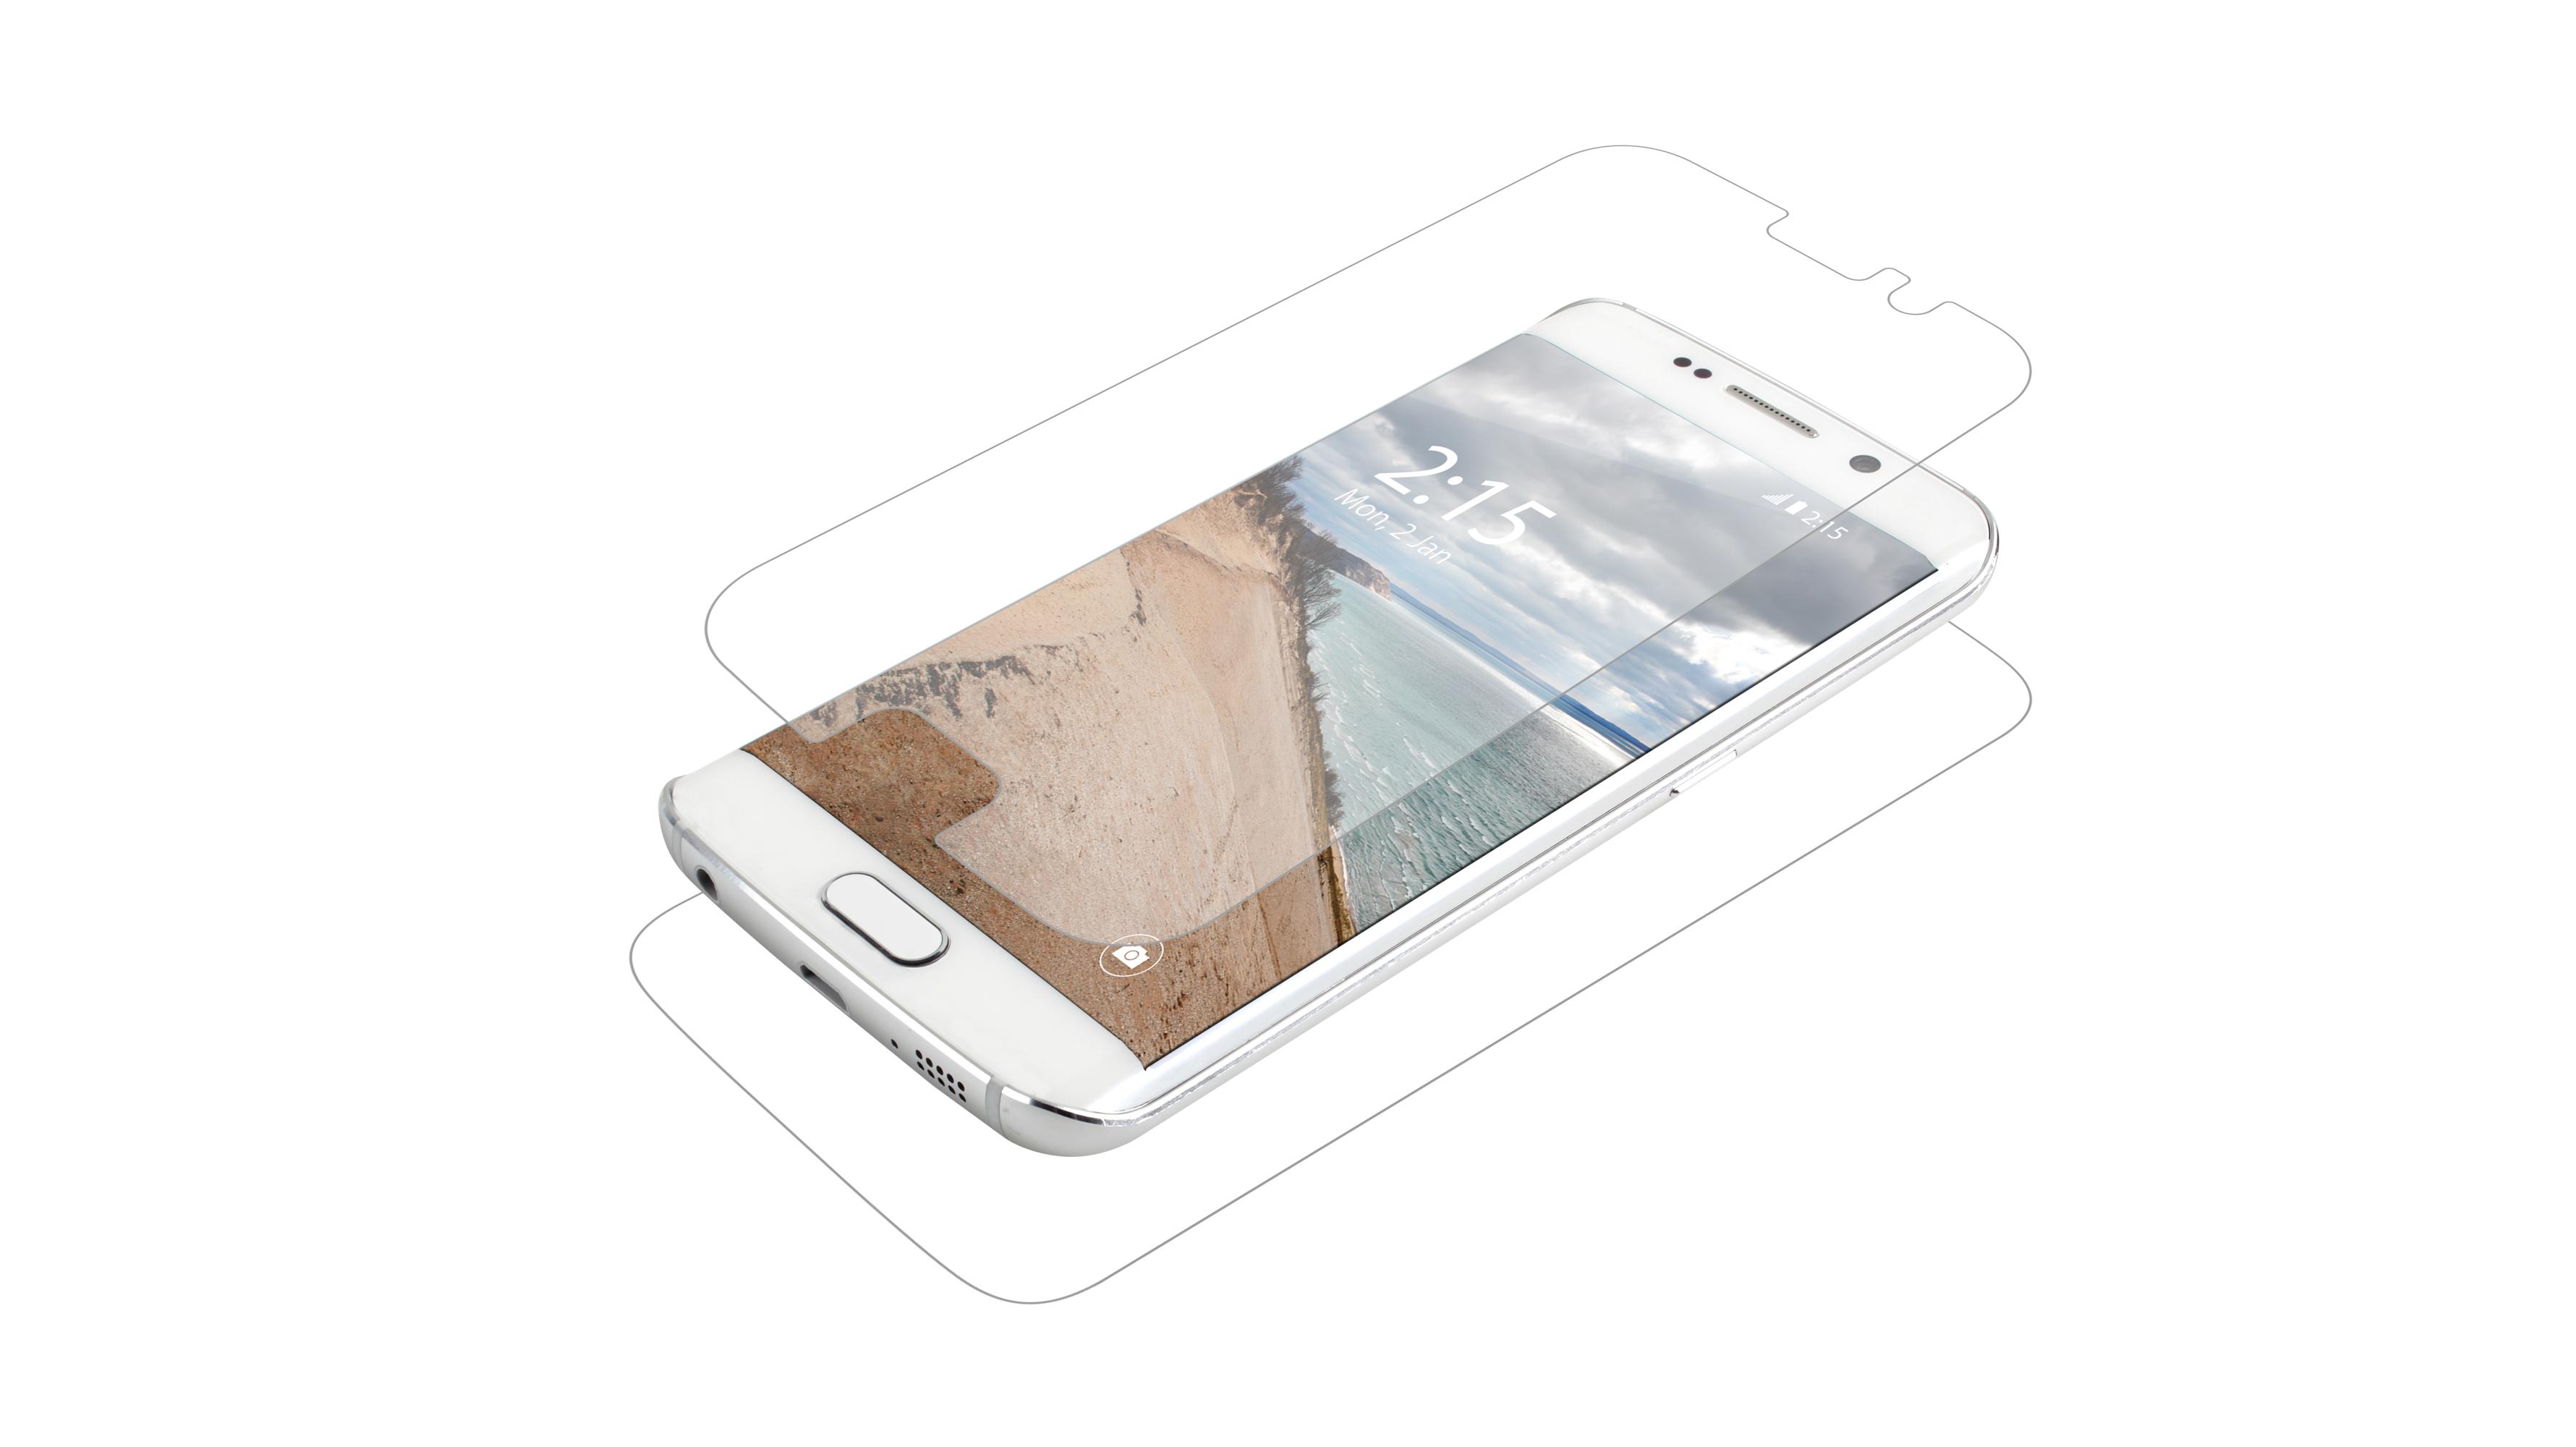 InvisibleShield Original for the Samsung Galaxy S6 edge